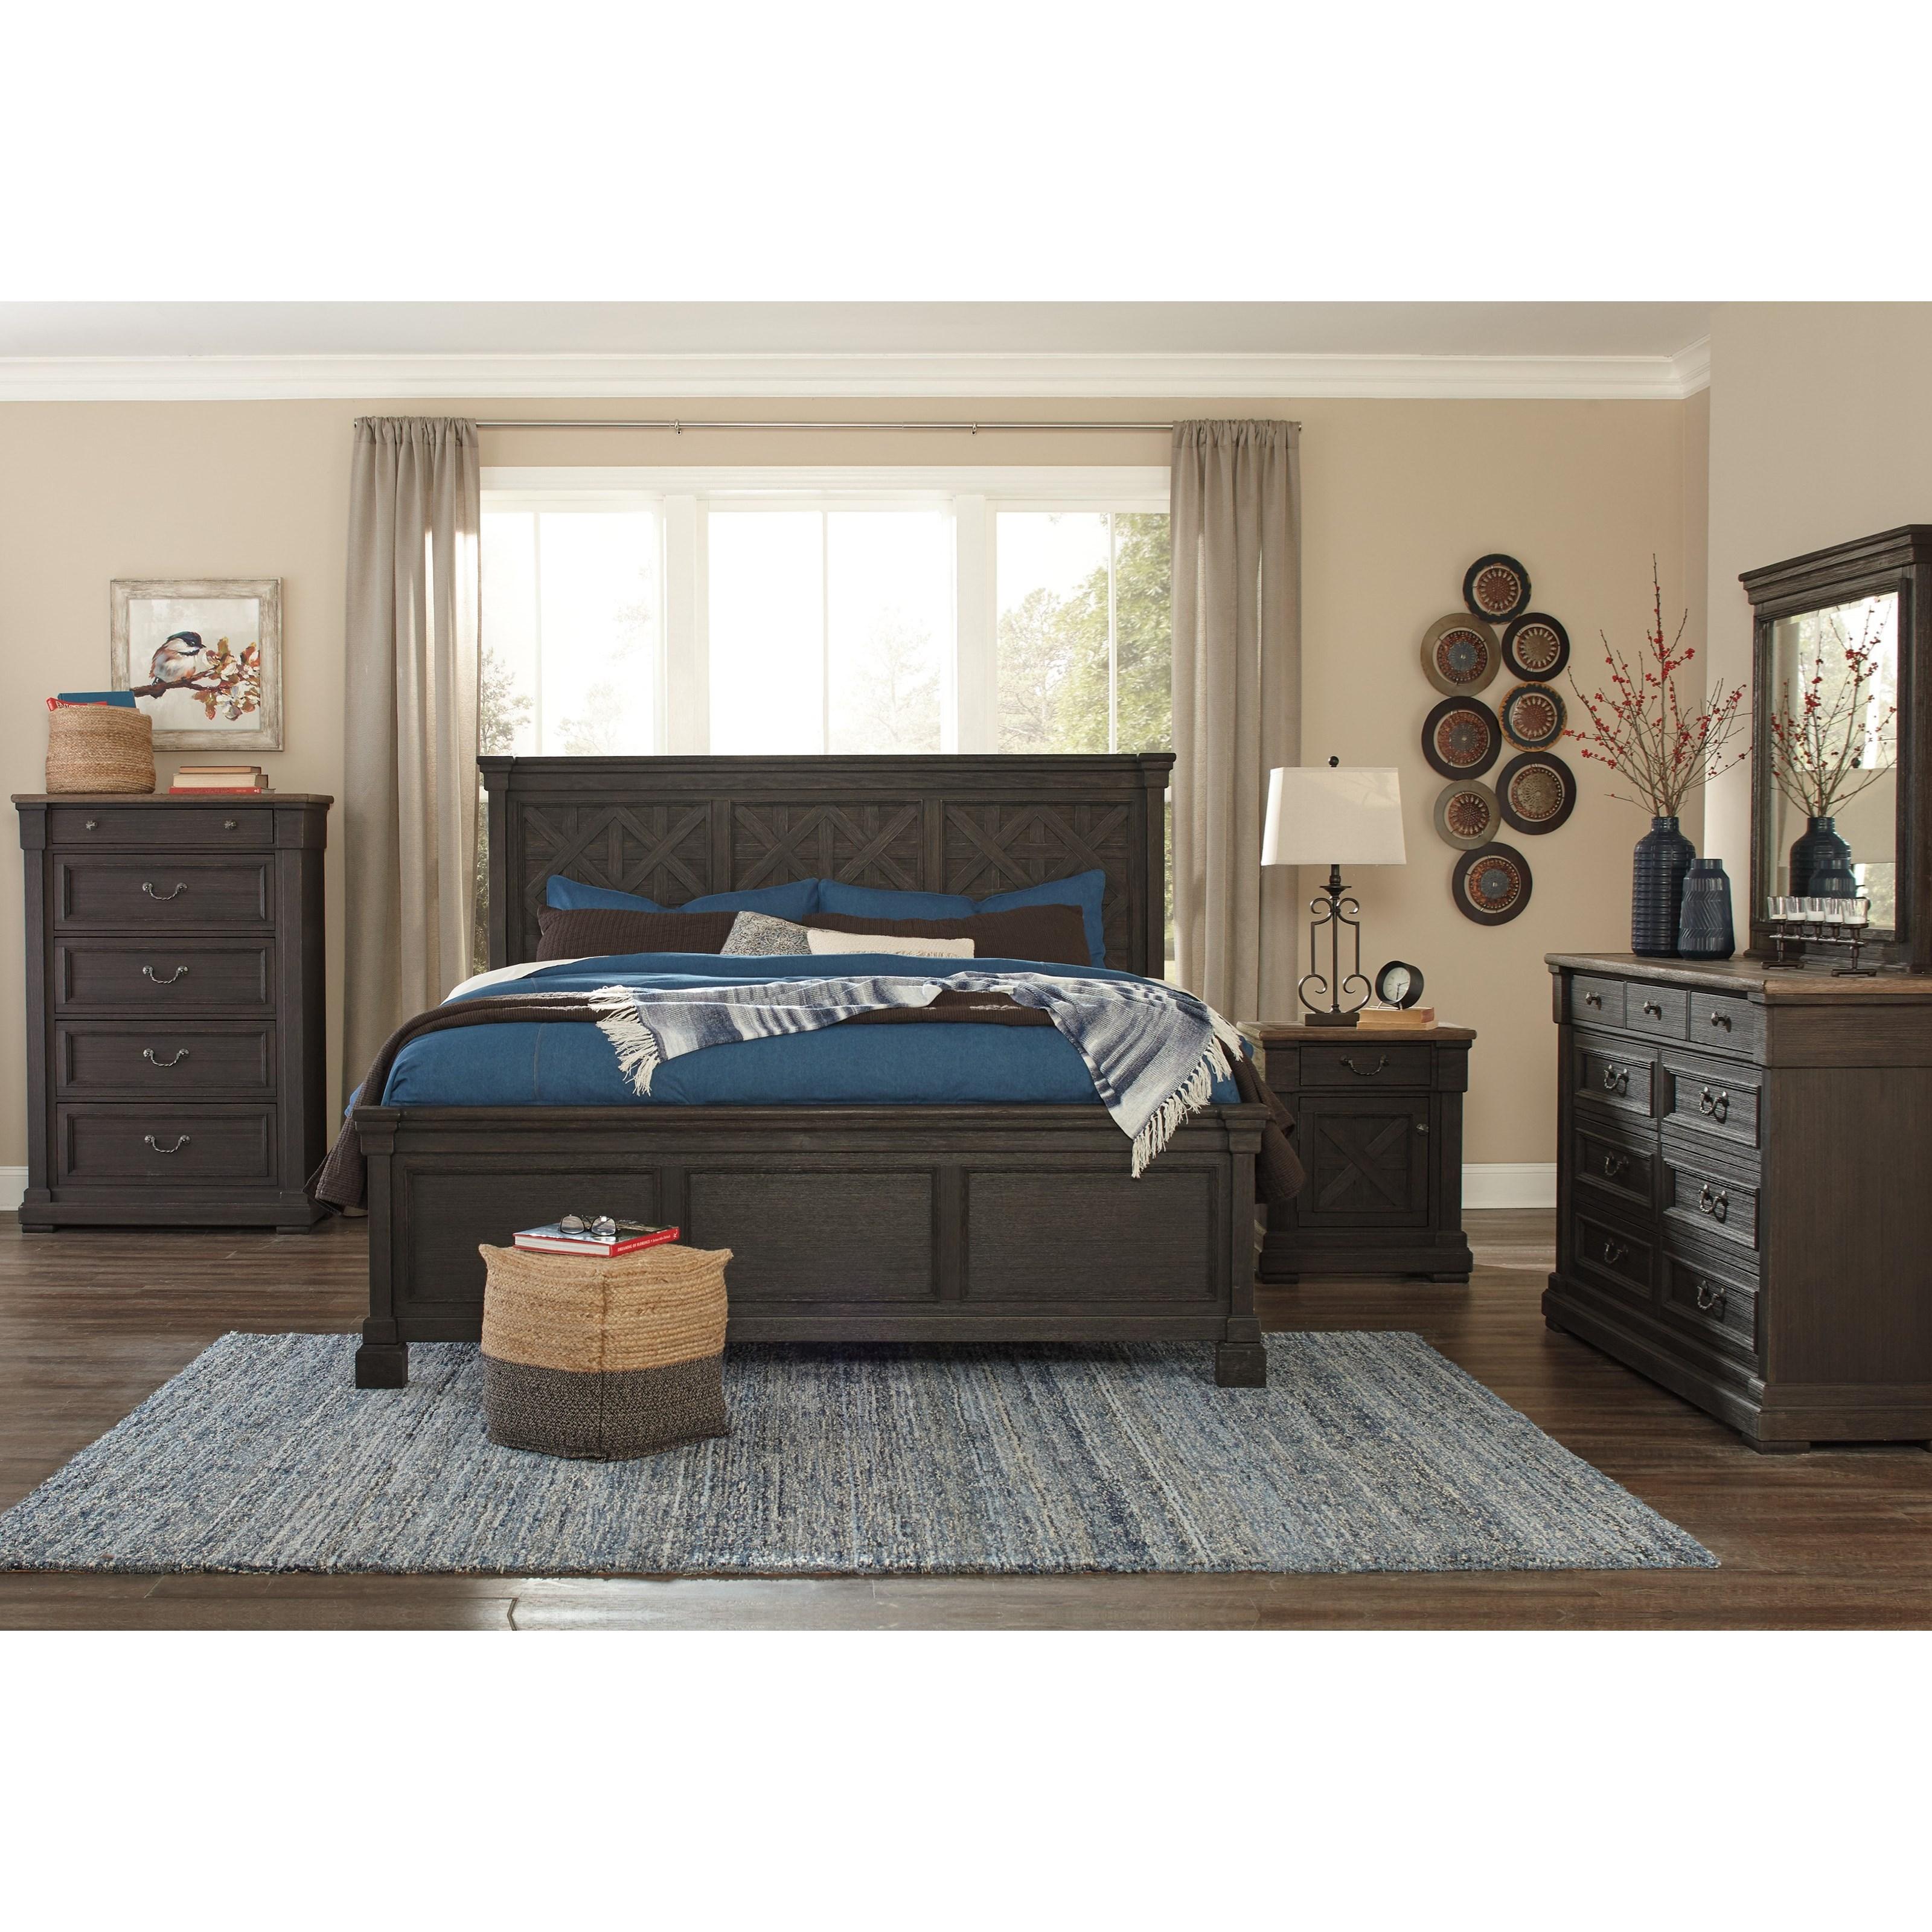 Signature Design By Ashley Tyler Creek California King Bedroom Group Reid 39 S Furniture